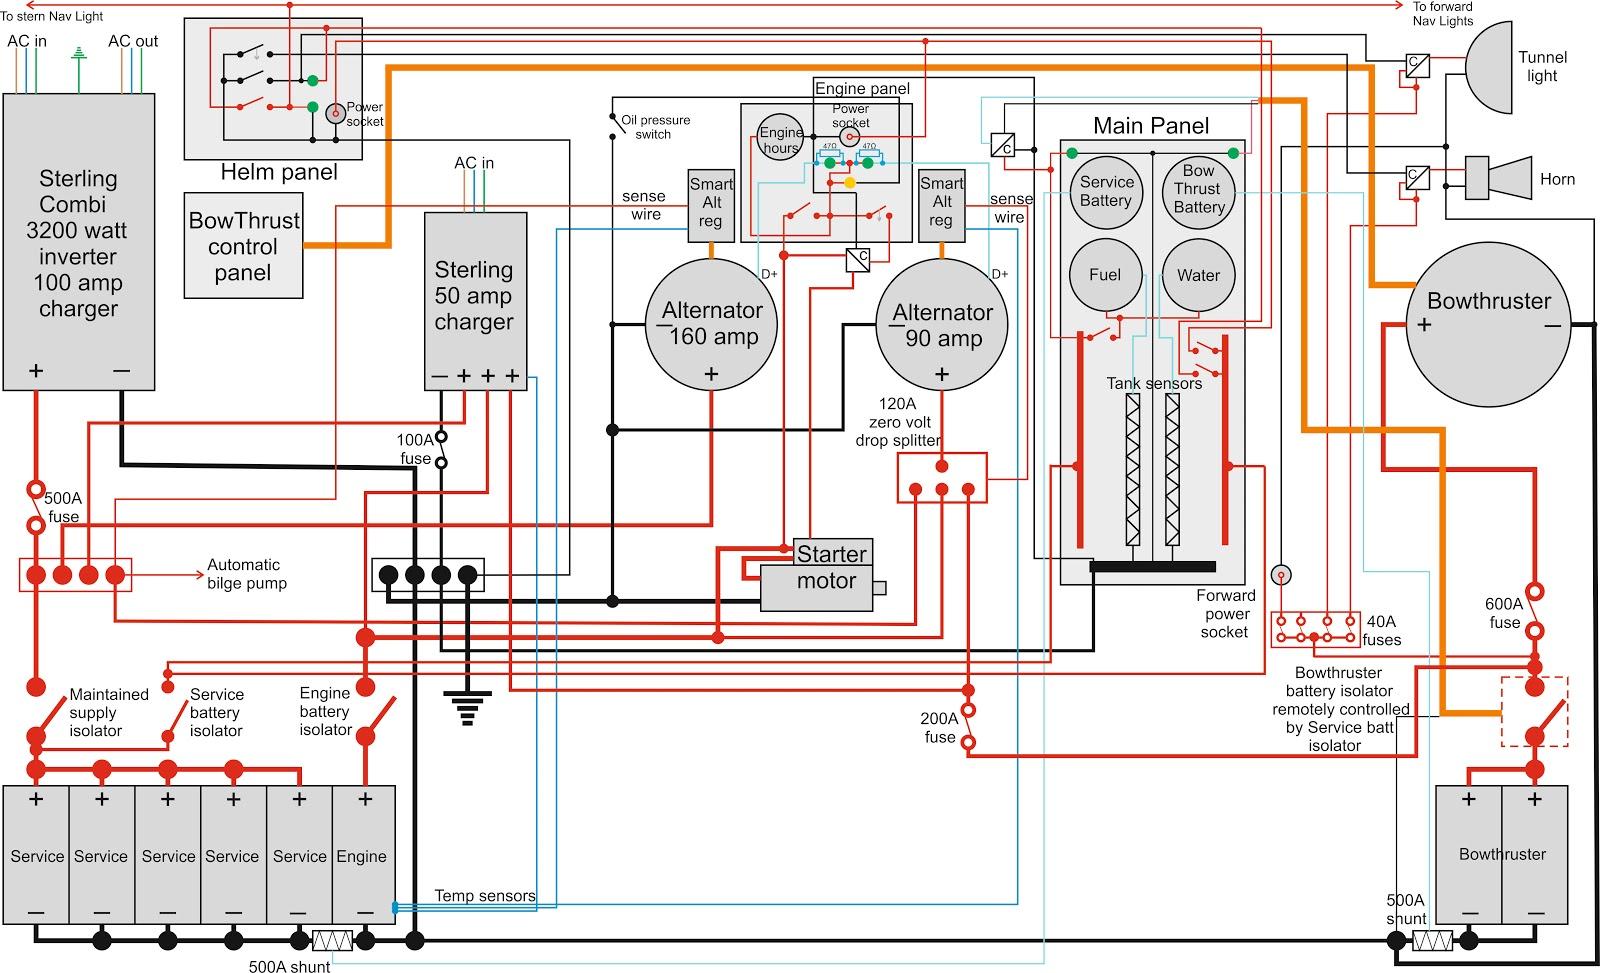 Hot Water Radiant Heat Systems Diagrams Wire Diagram Combi Boiler Underfloor Heating Wiring Blogspot Com 1600x973